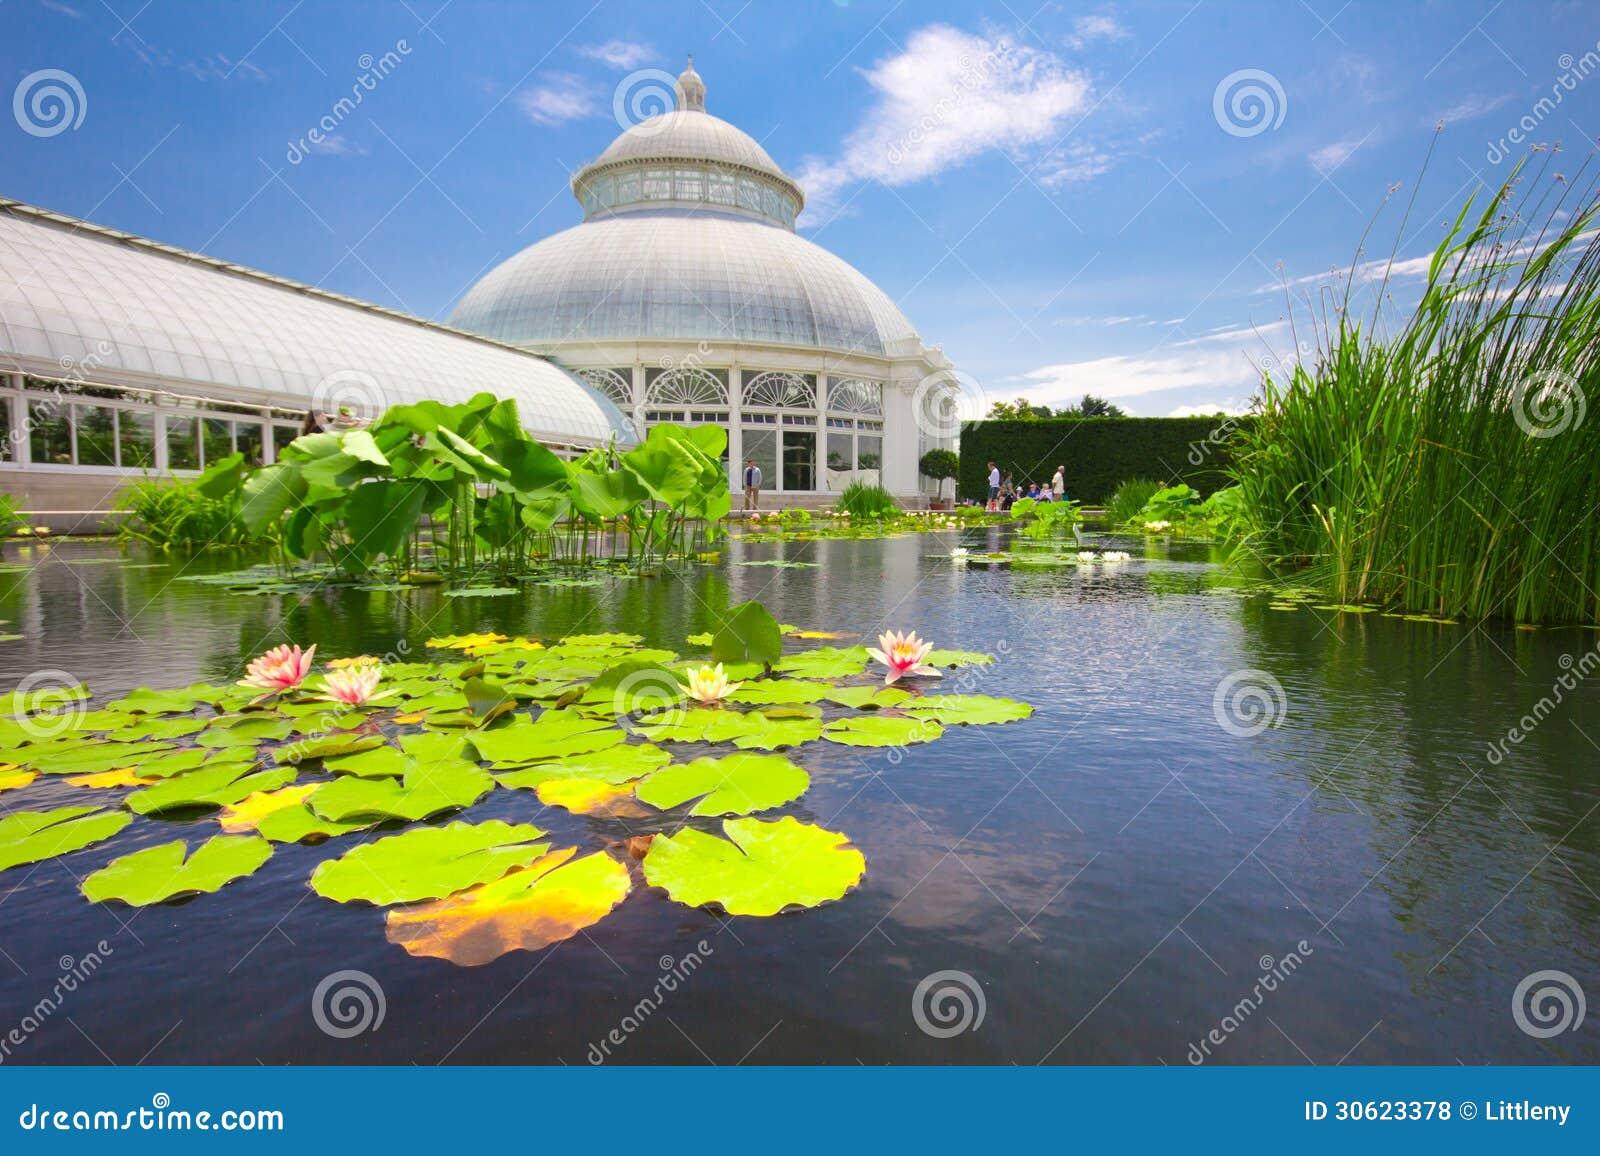 New york botanical garden editorial stock photo image of for Landscape design center